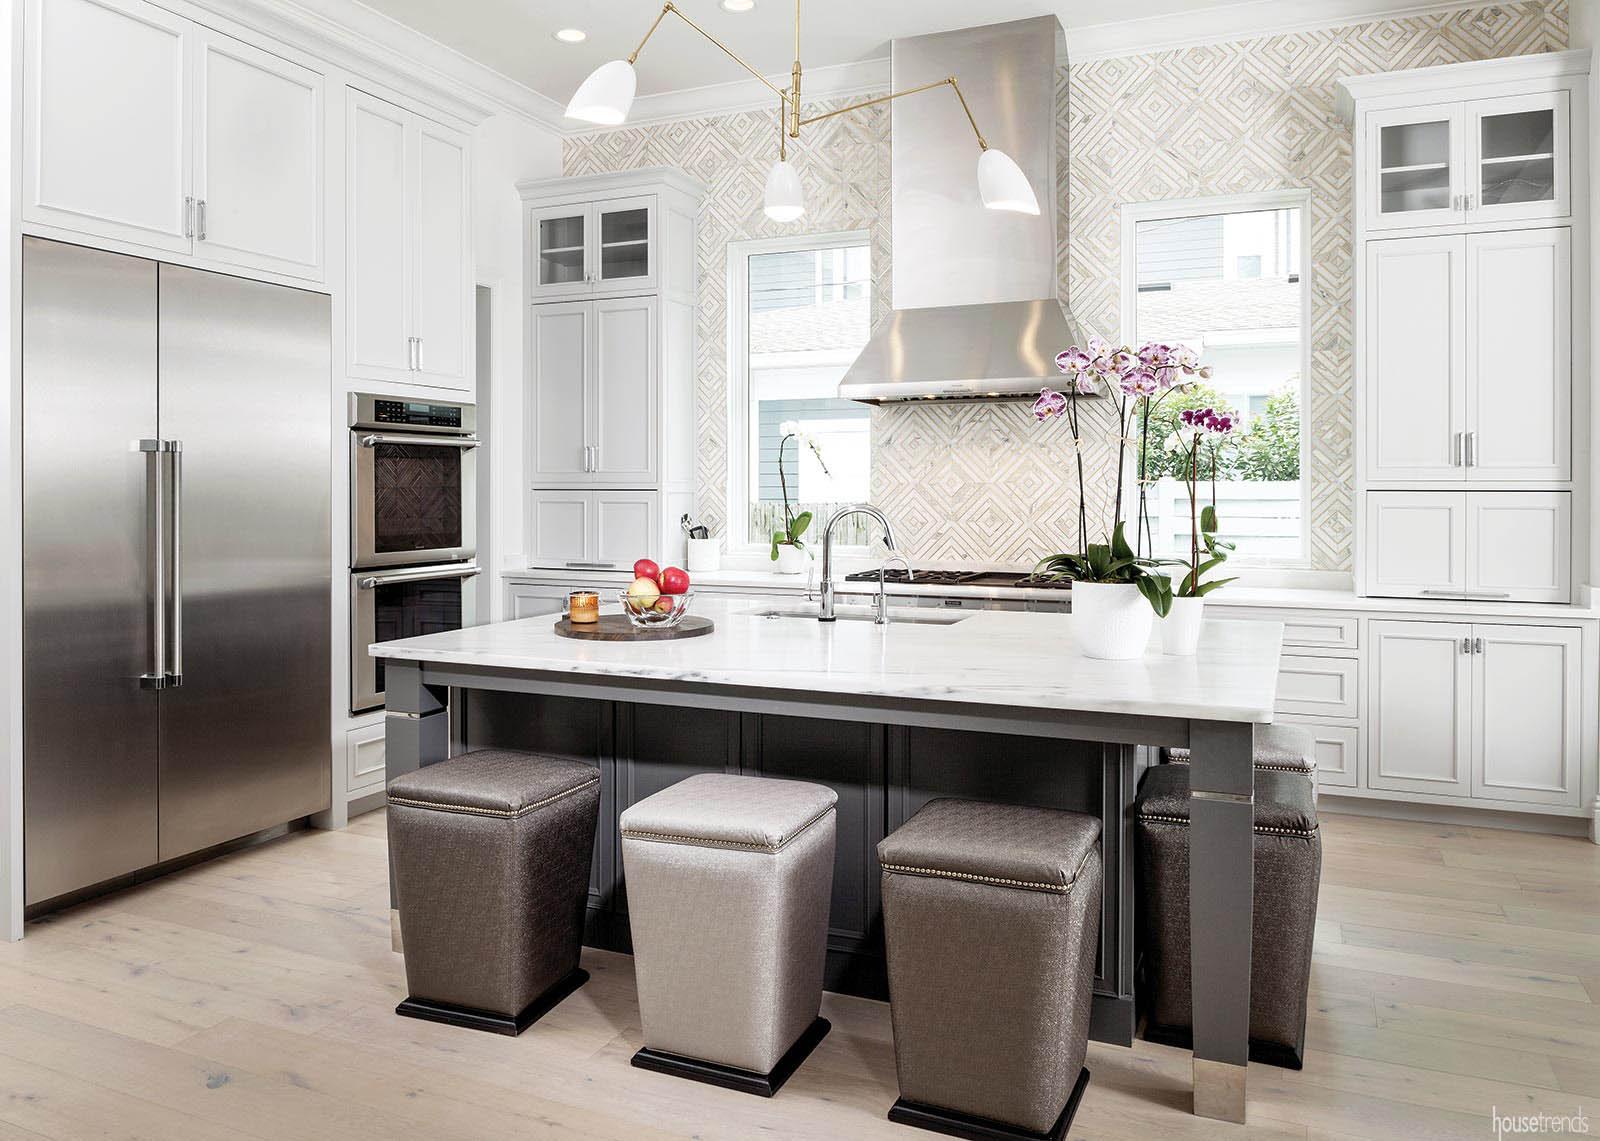 Kitchen boasts an appliance wall